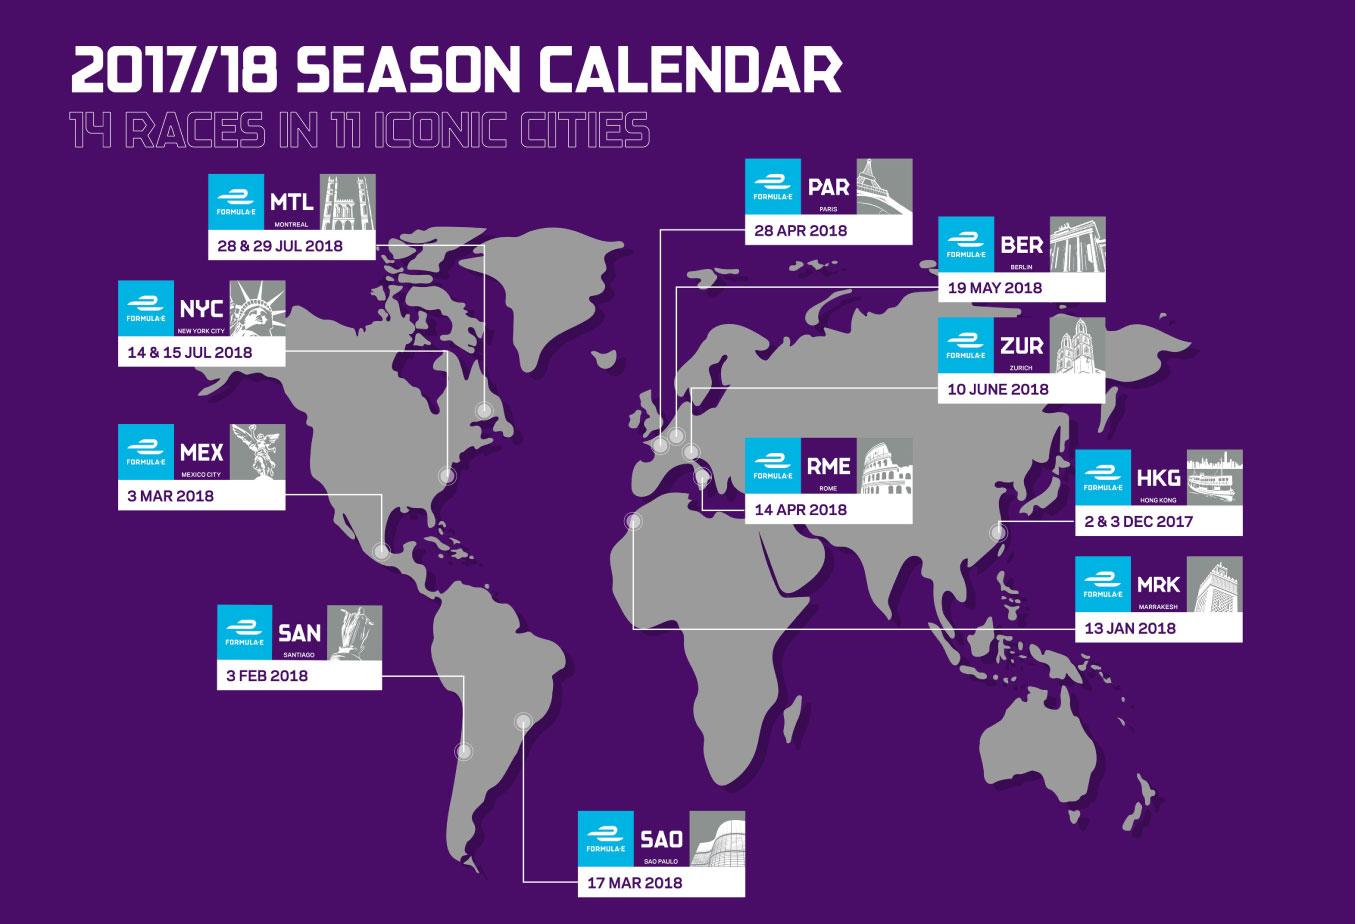 calendario Formula E 2017-2018